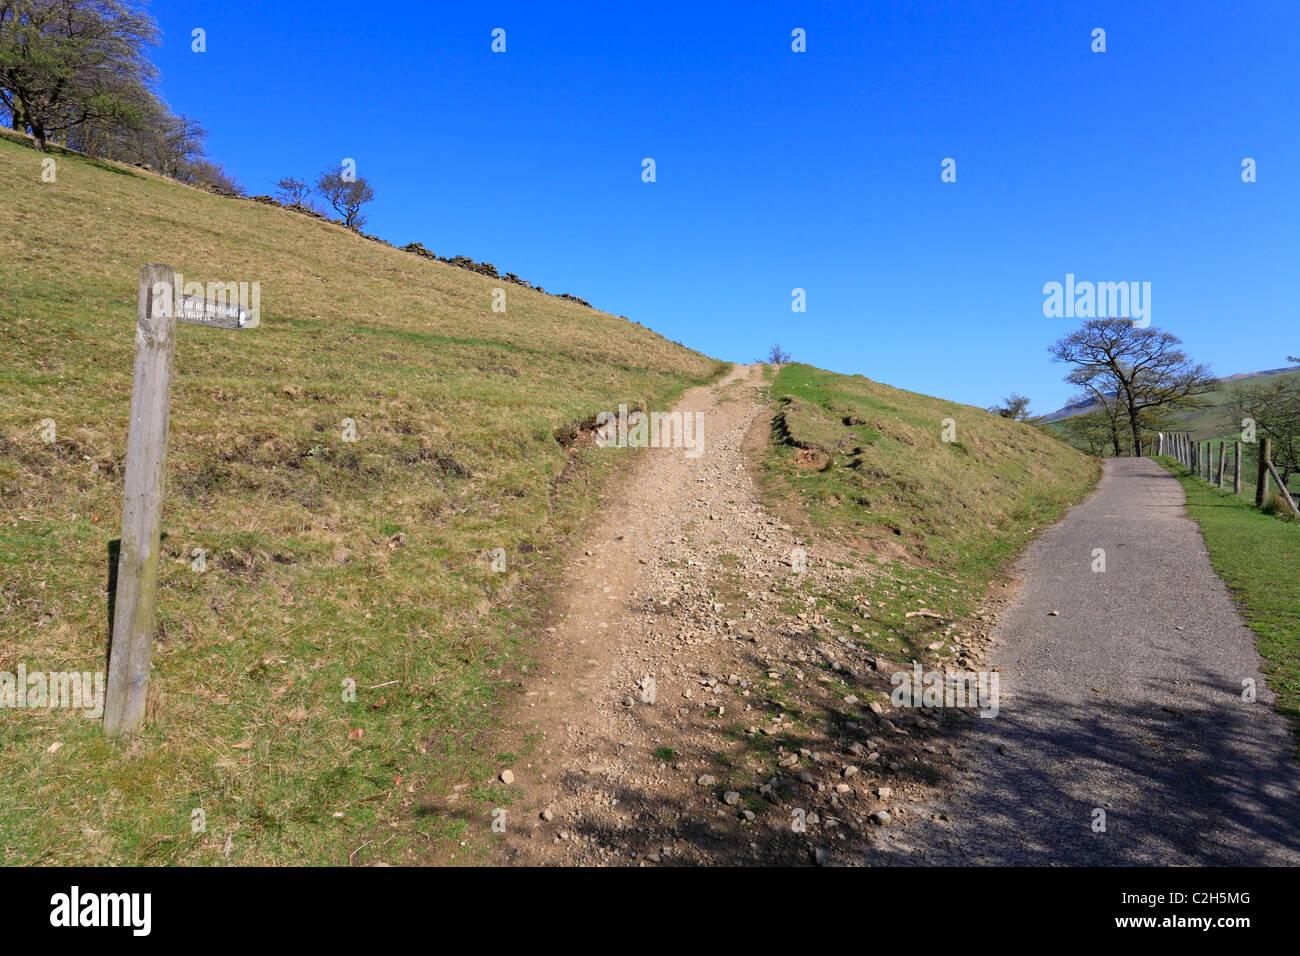 Pennine Bridleway, Hayfield, Derbyshire, Peak District National Park, England, UK. - Stock Image